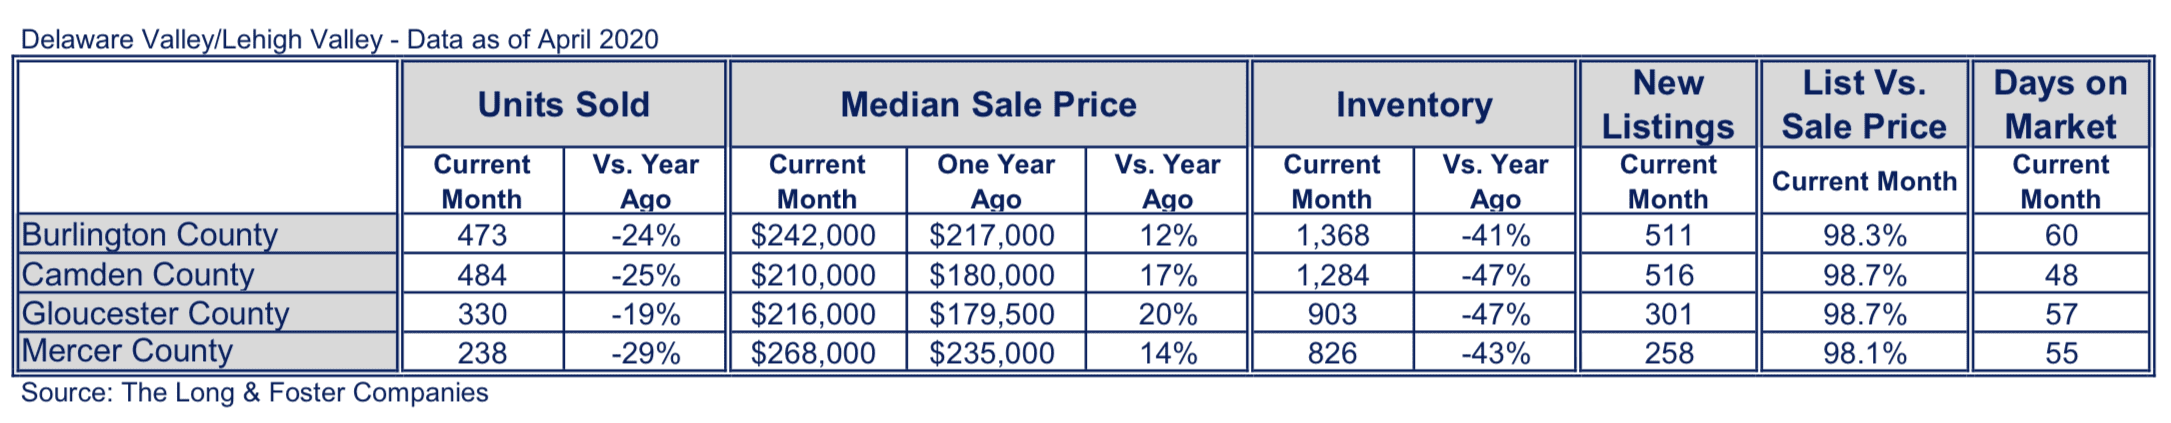 New Jersey Suburbs Market Minute Chart April 2020